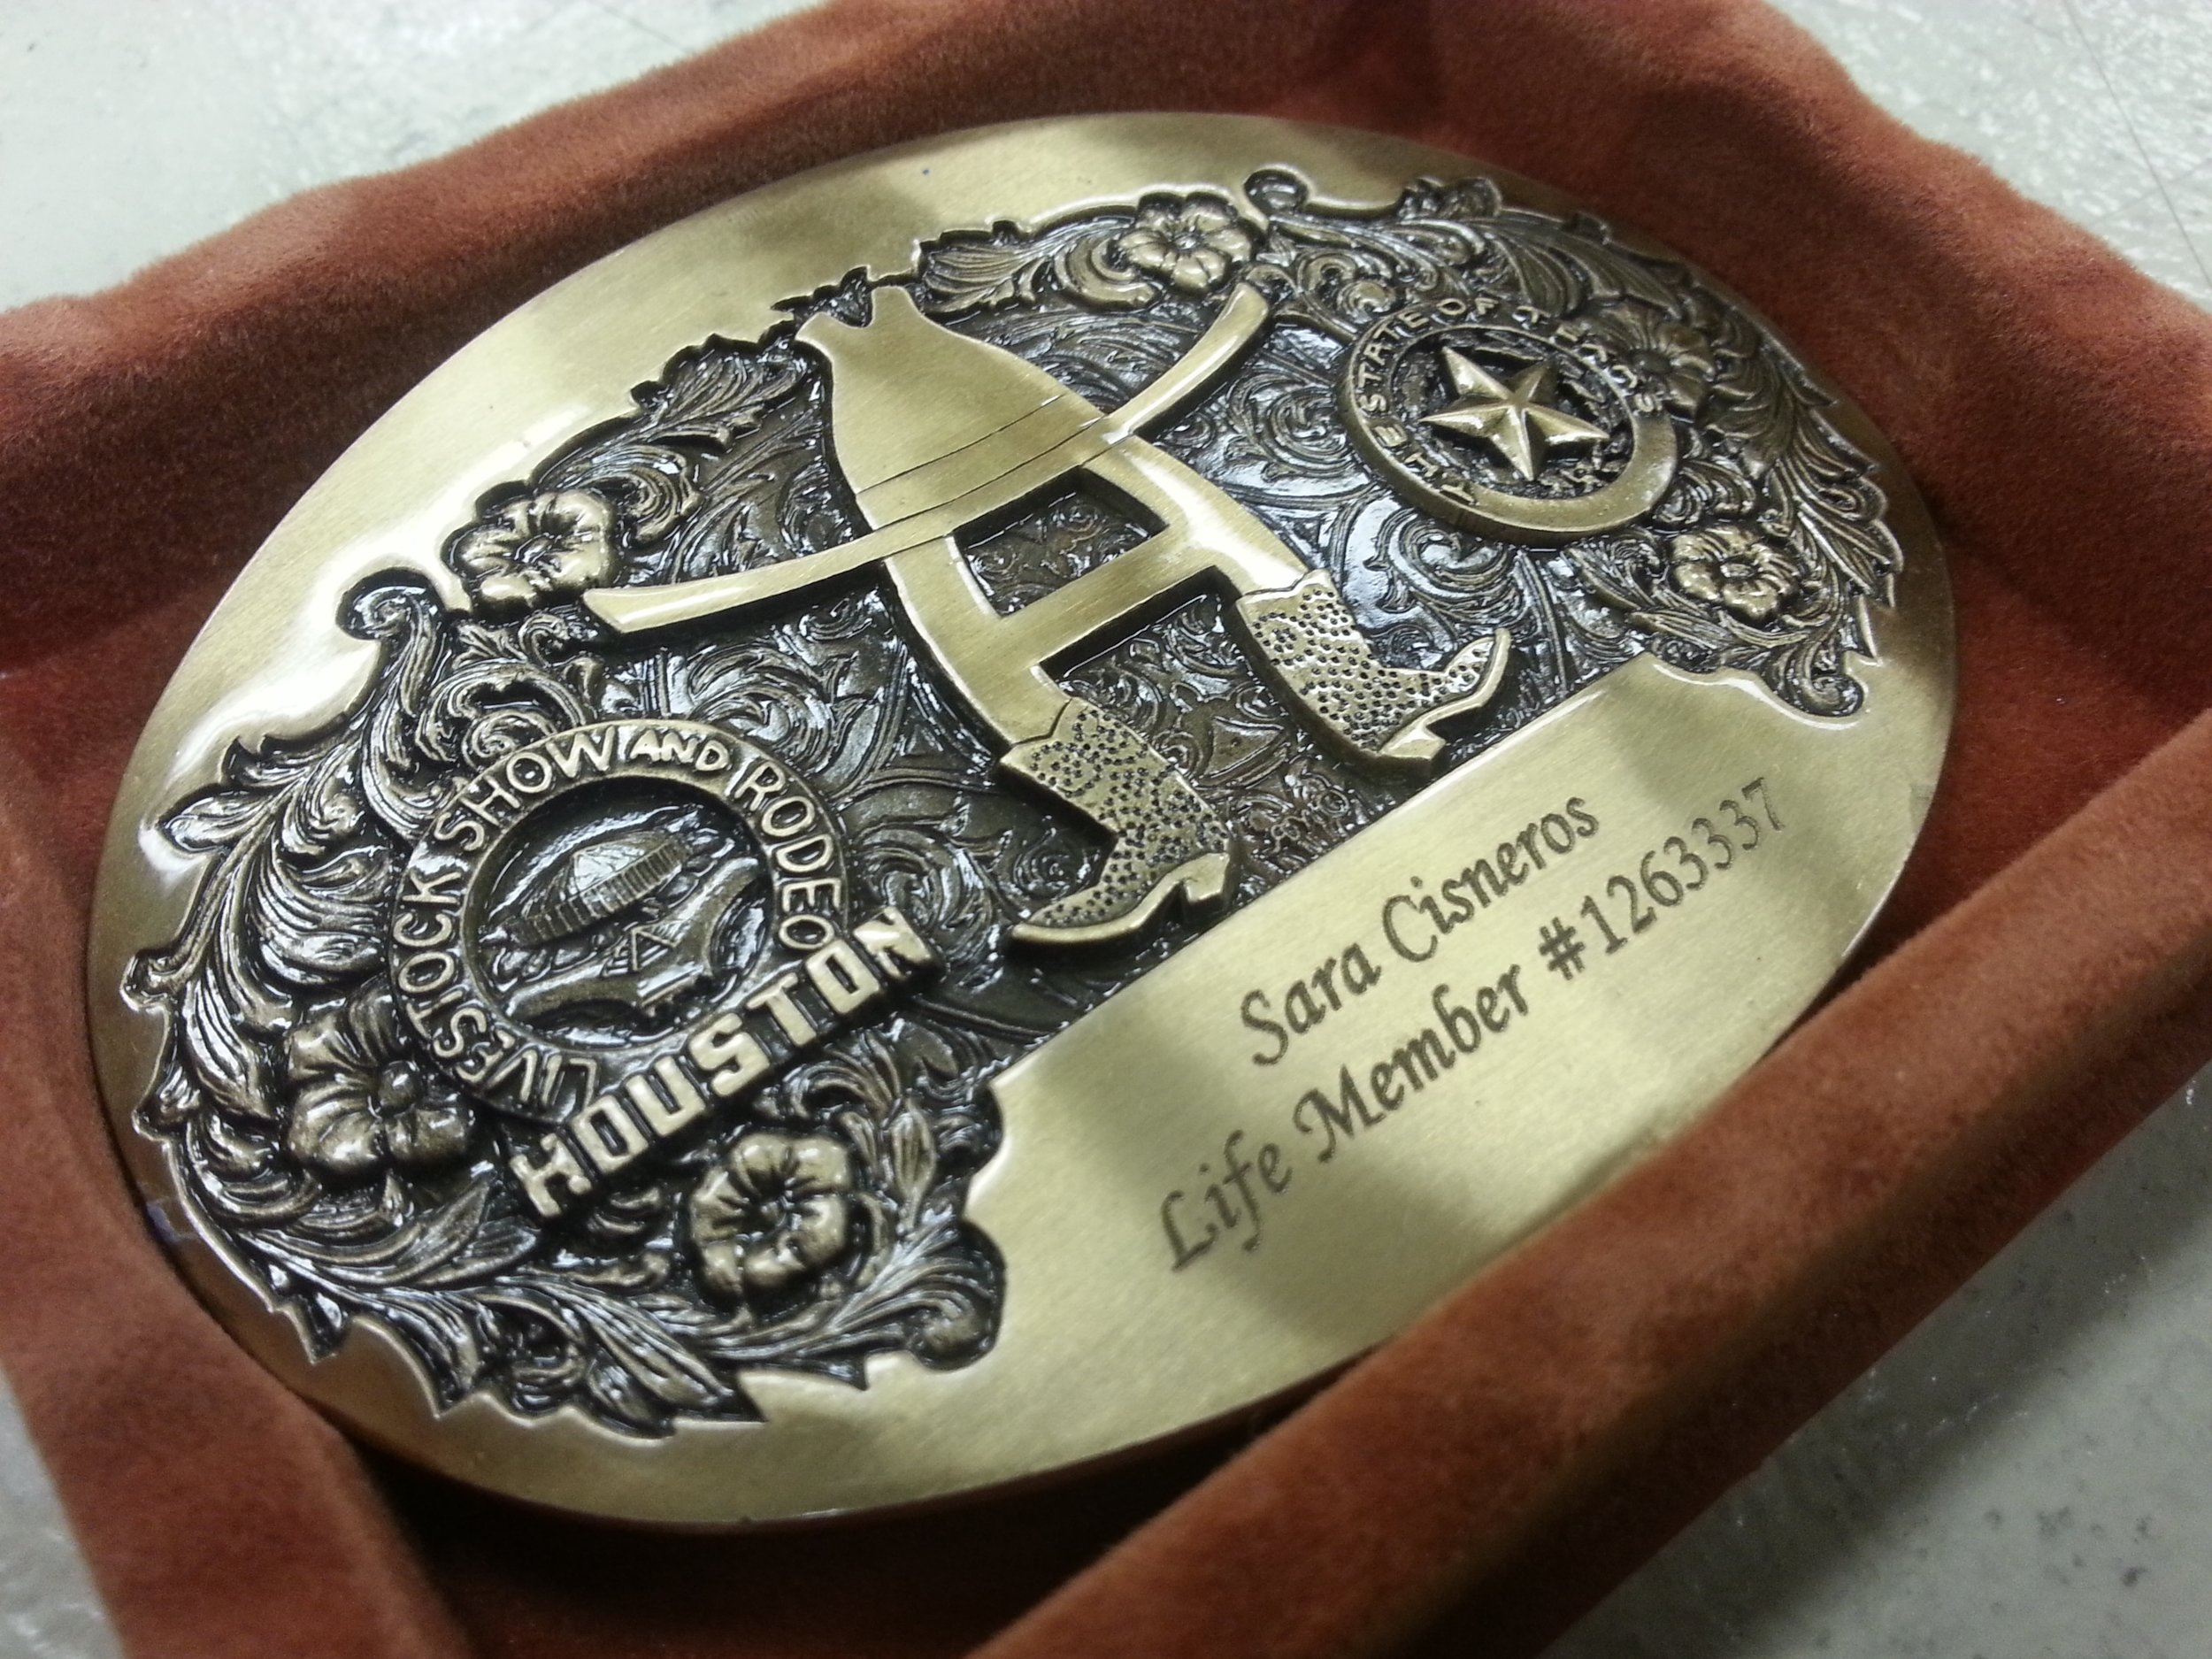 engraved houston rodeo belt buckle